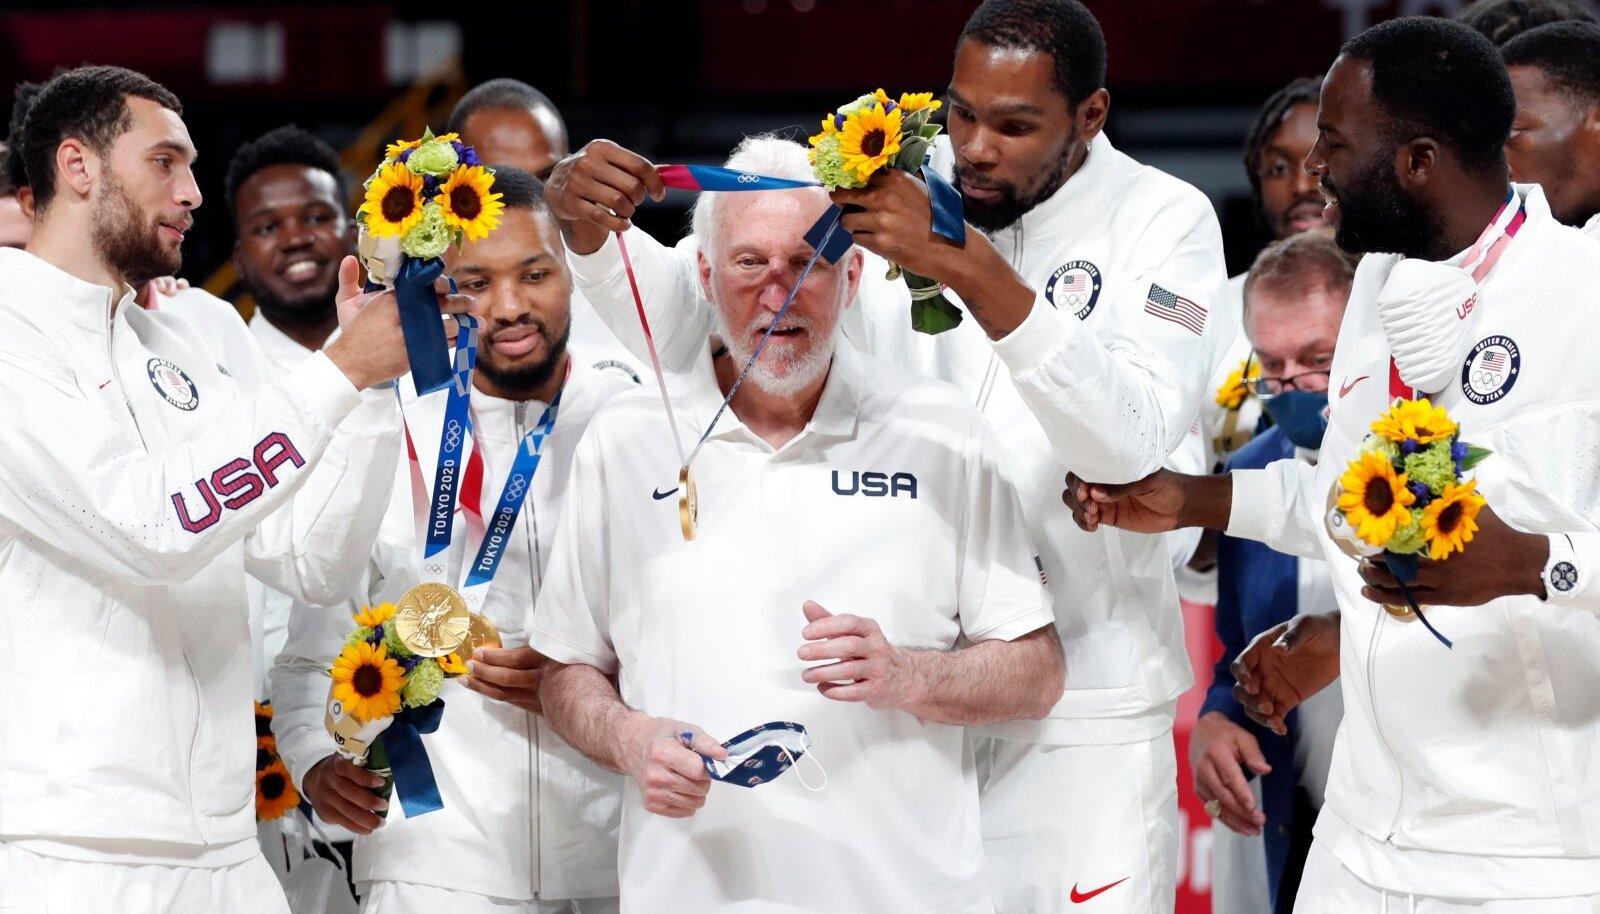 Südamlik hetk: Kevin Durant paneb oma kuldmedali peatreener Gregg Popovichi kaela.